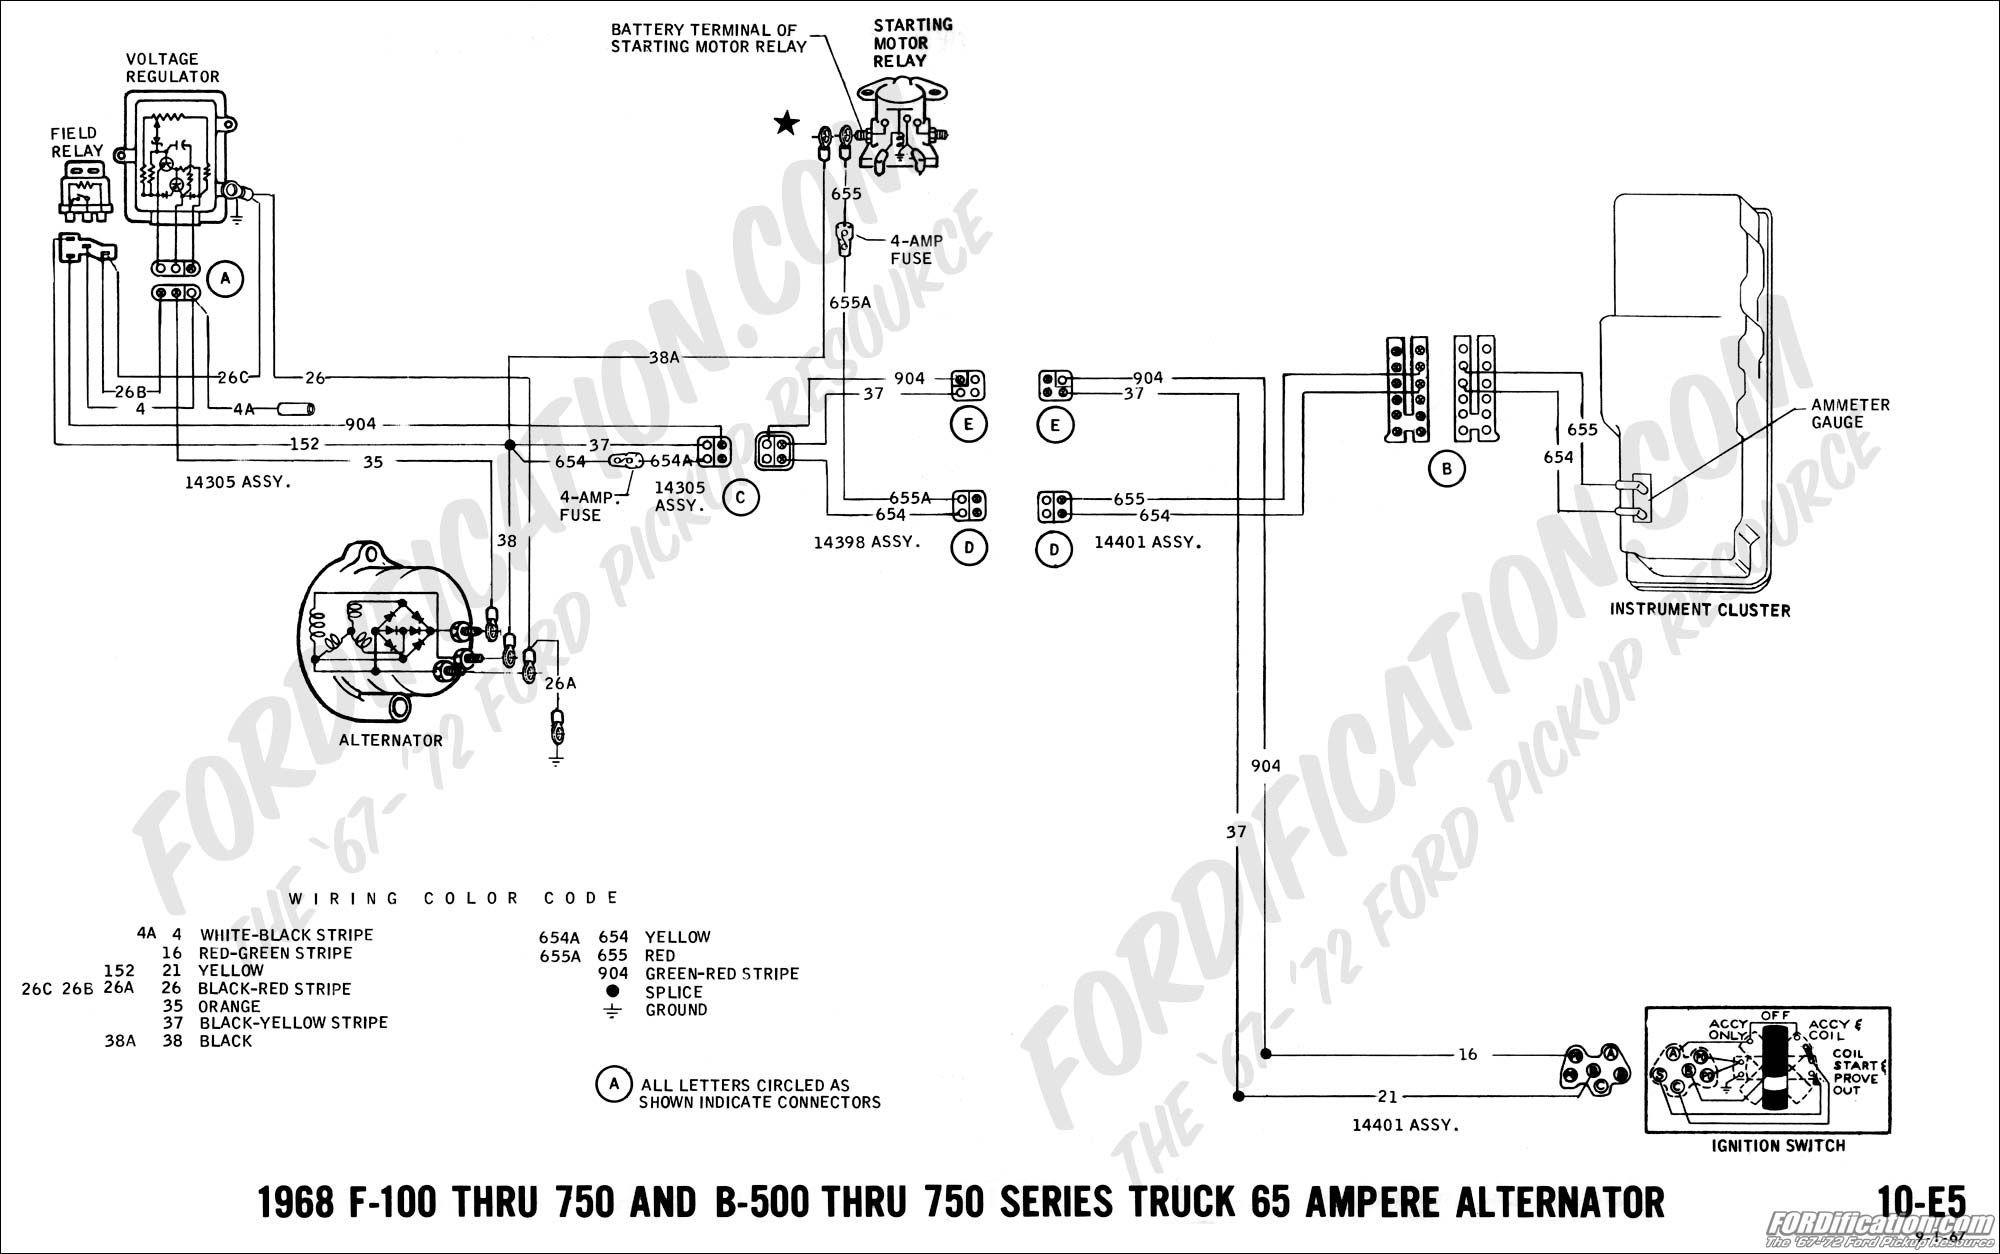 Wiring Diagram Symbols Pdf Wiring Diagram Symbols Car Wiring Diagram